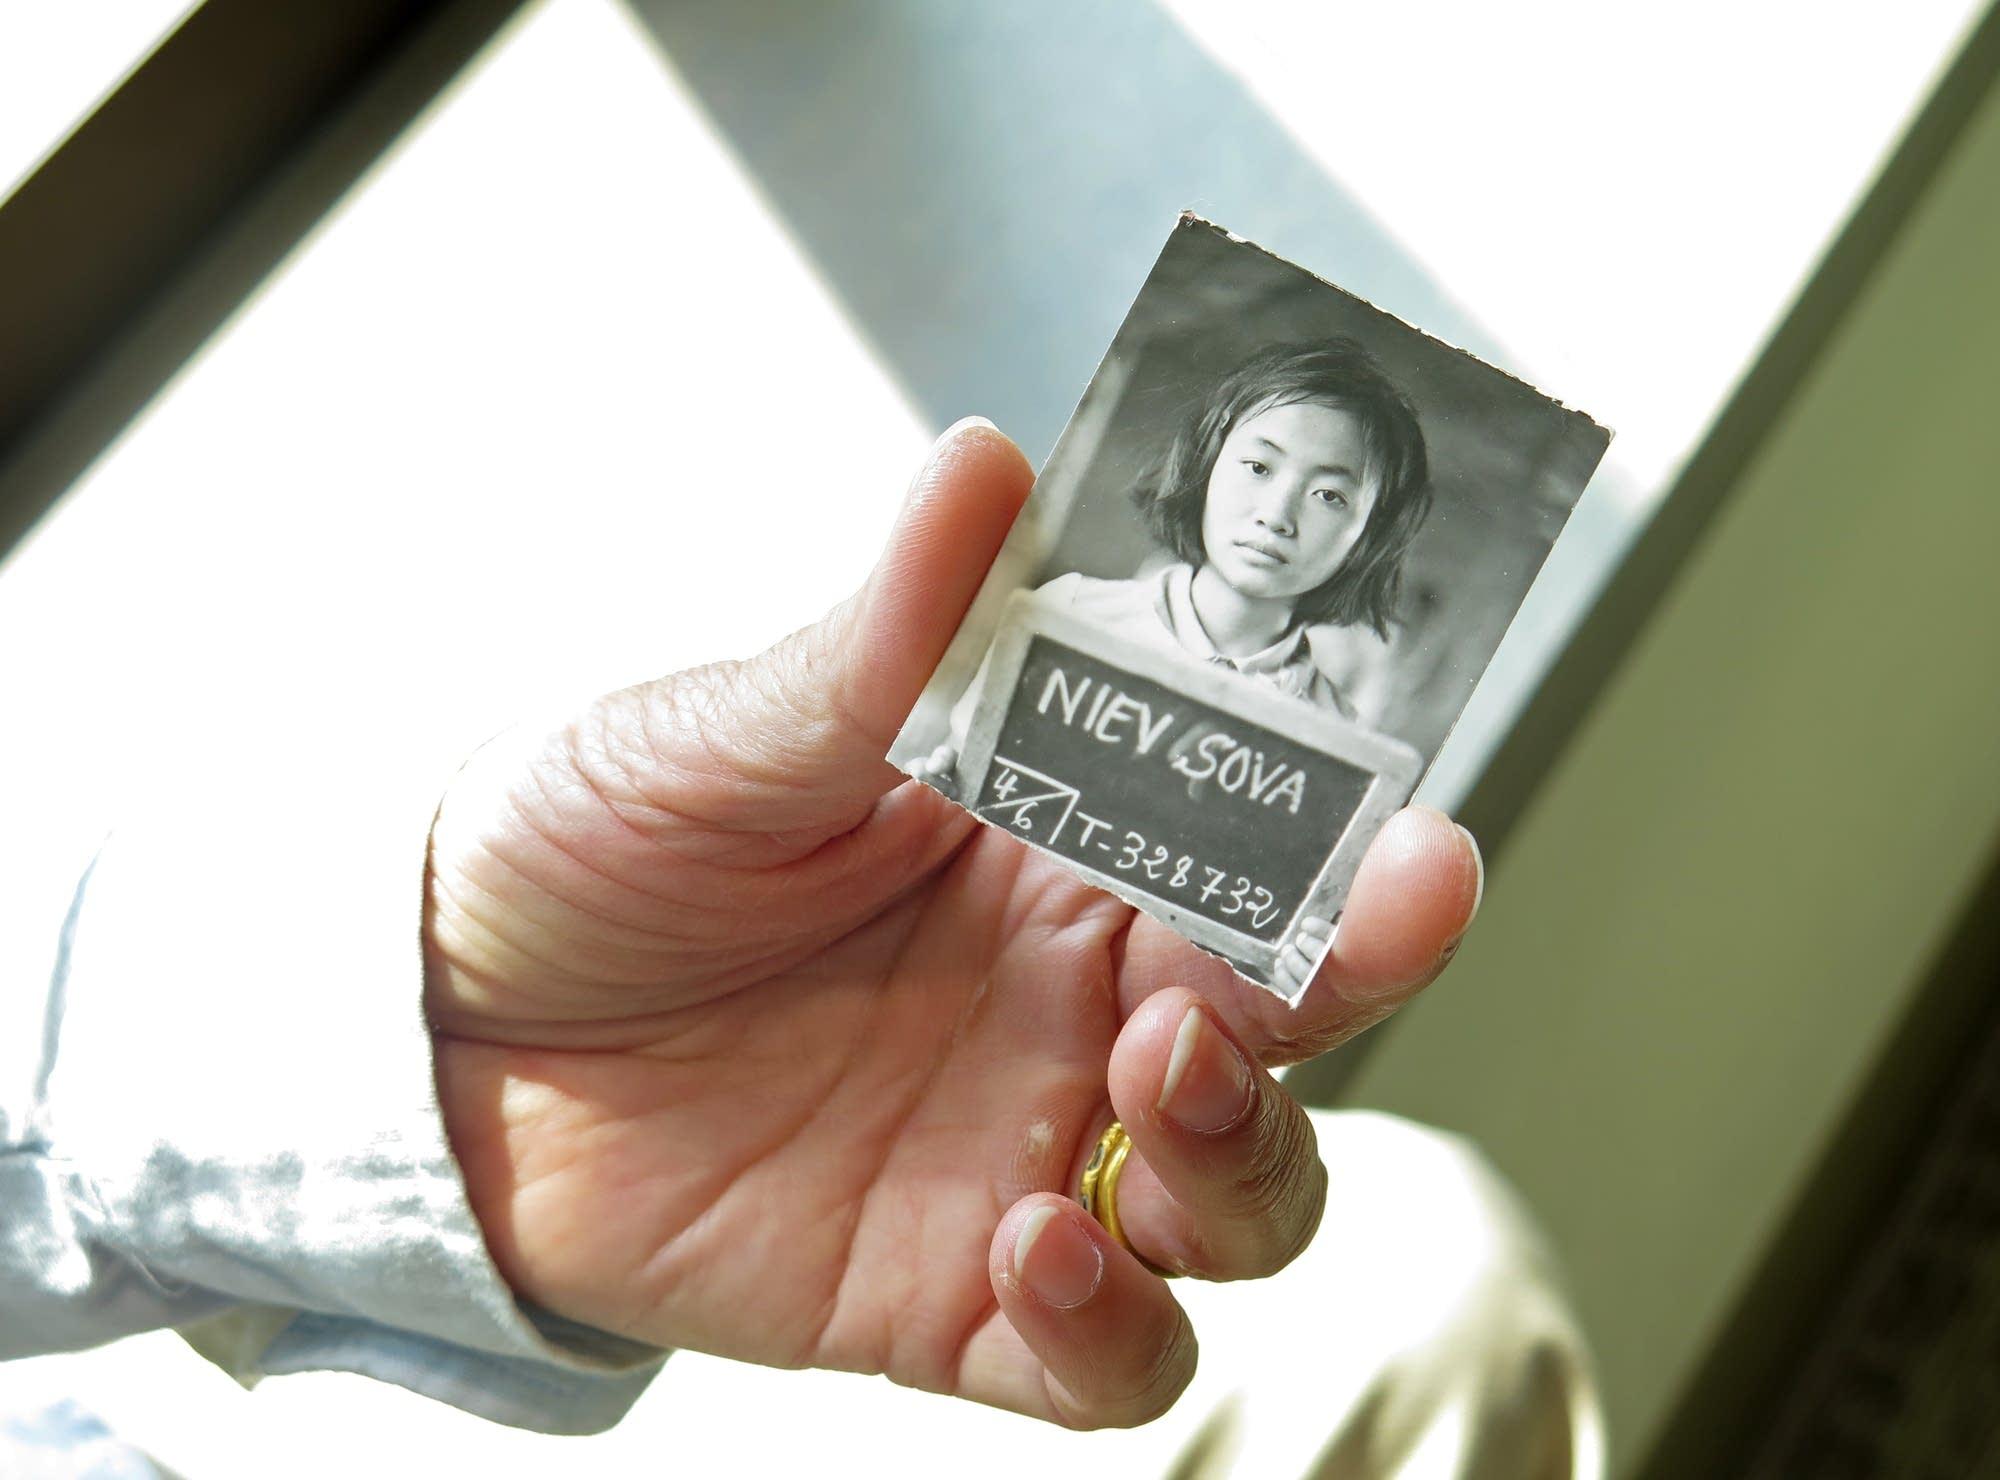 An identification photo of Sova Niev.